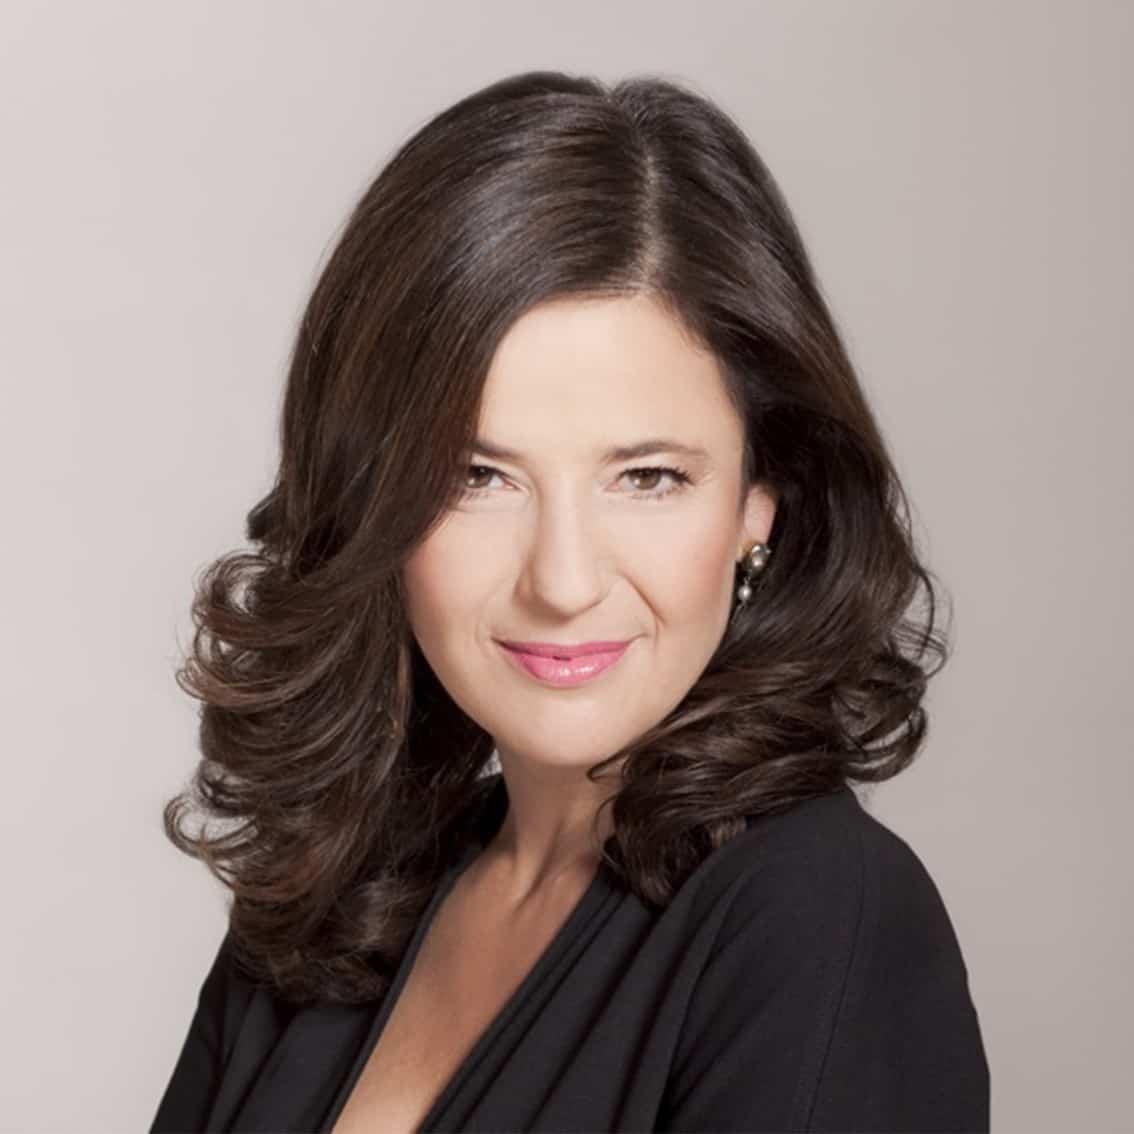 Katarzyna Miller-Greszta